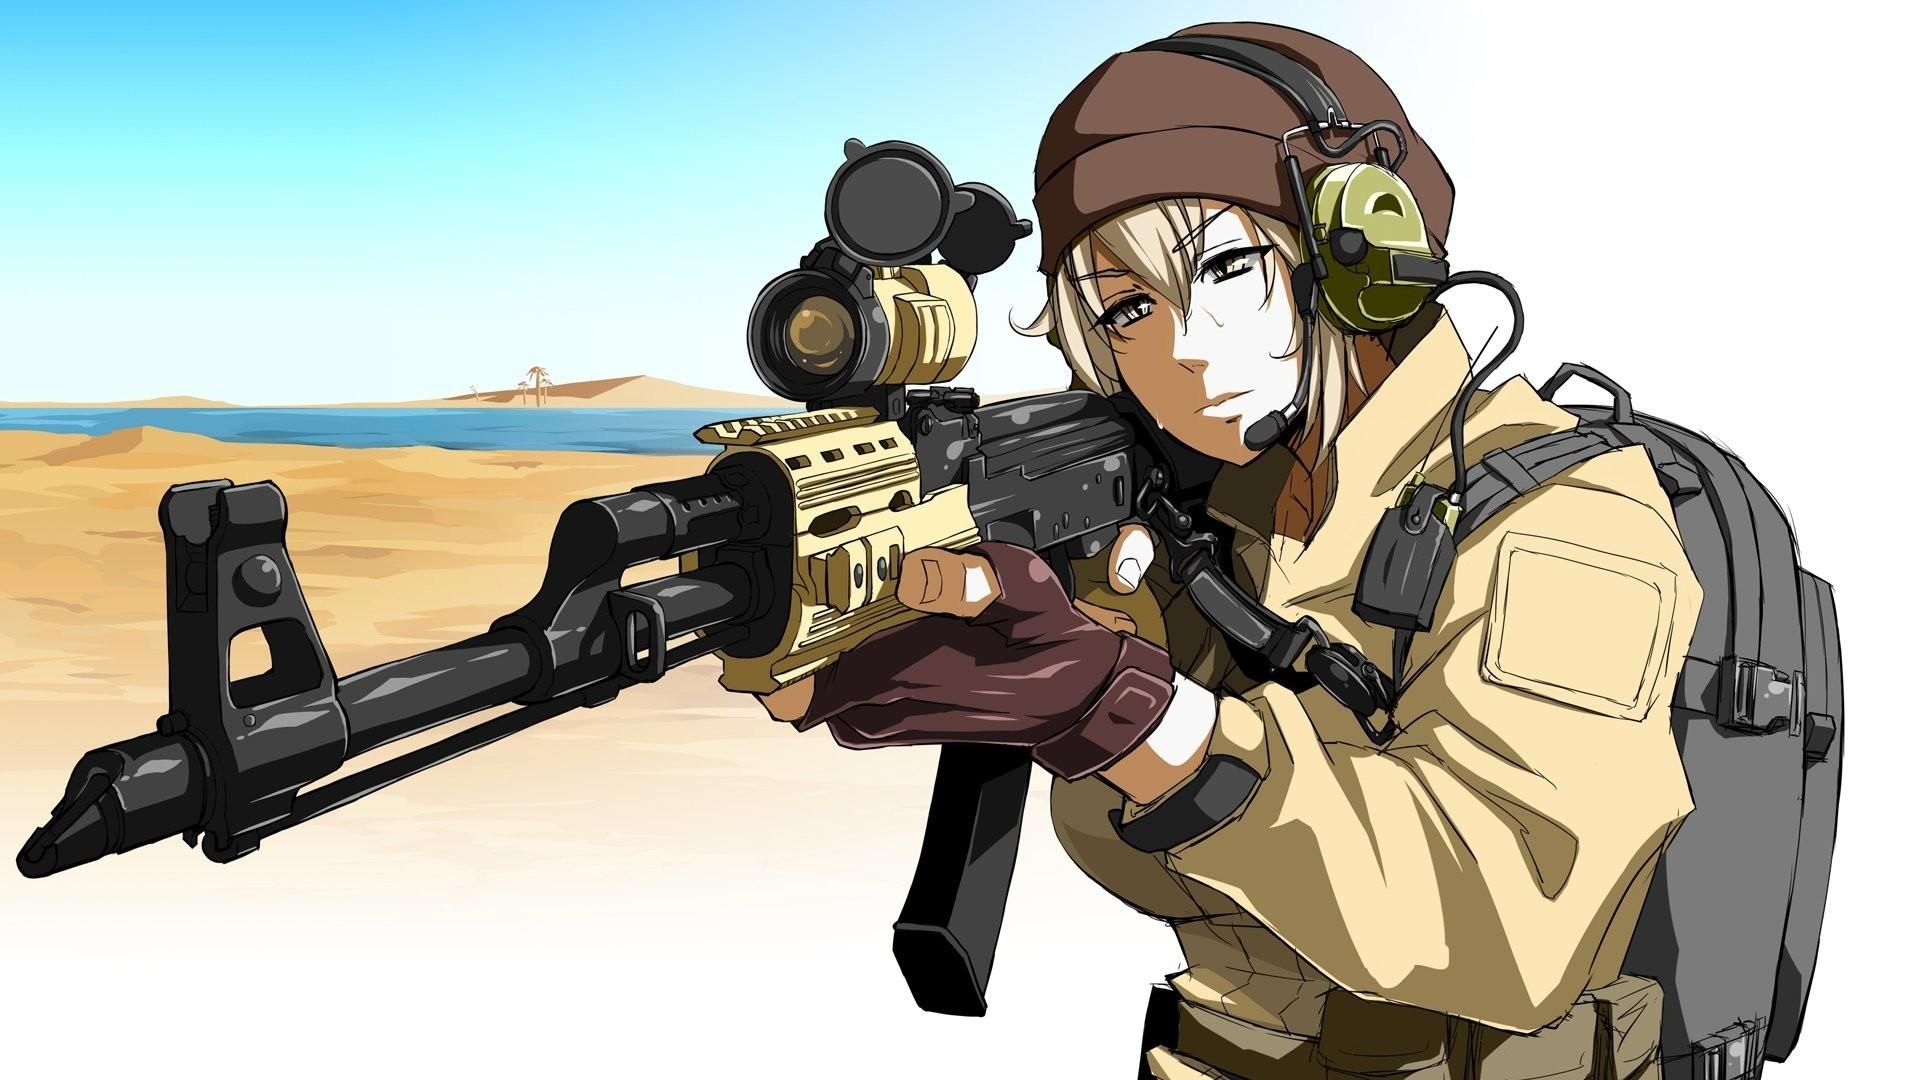 Anime Girls With Guns Wallpaper HD